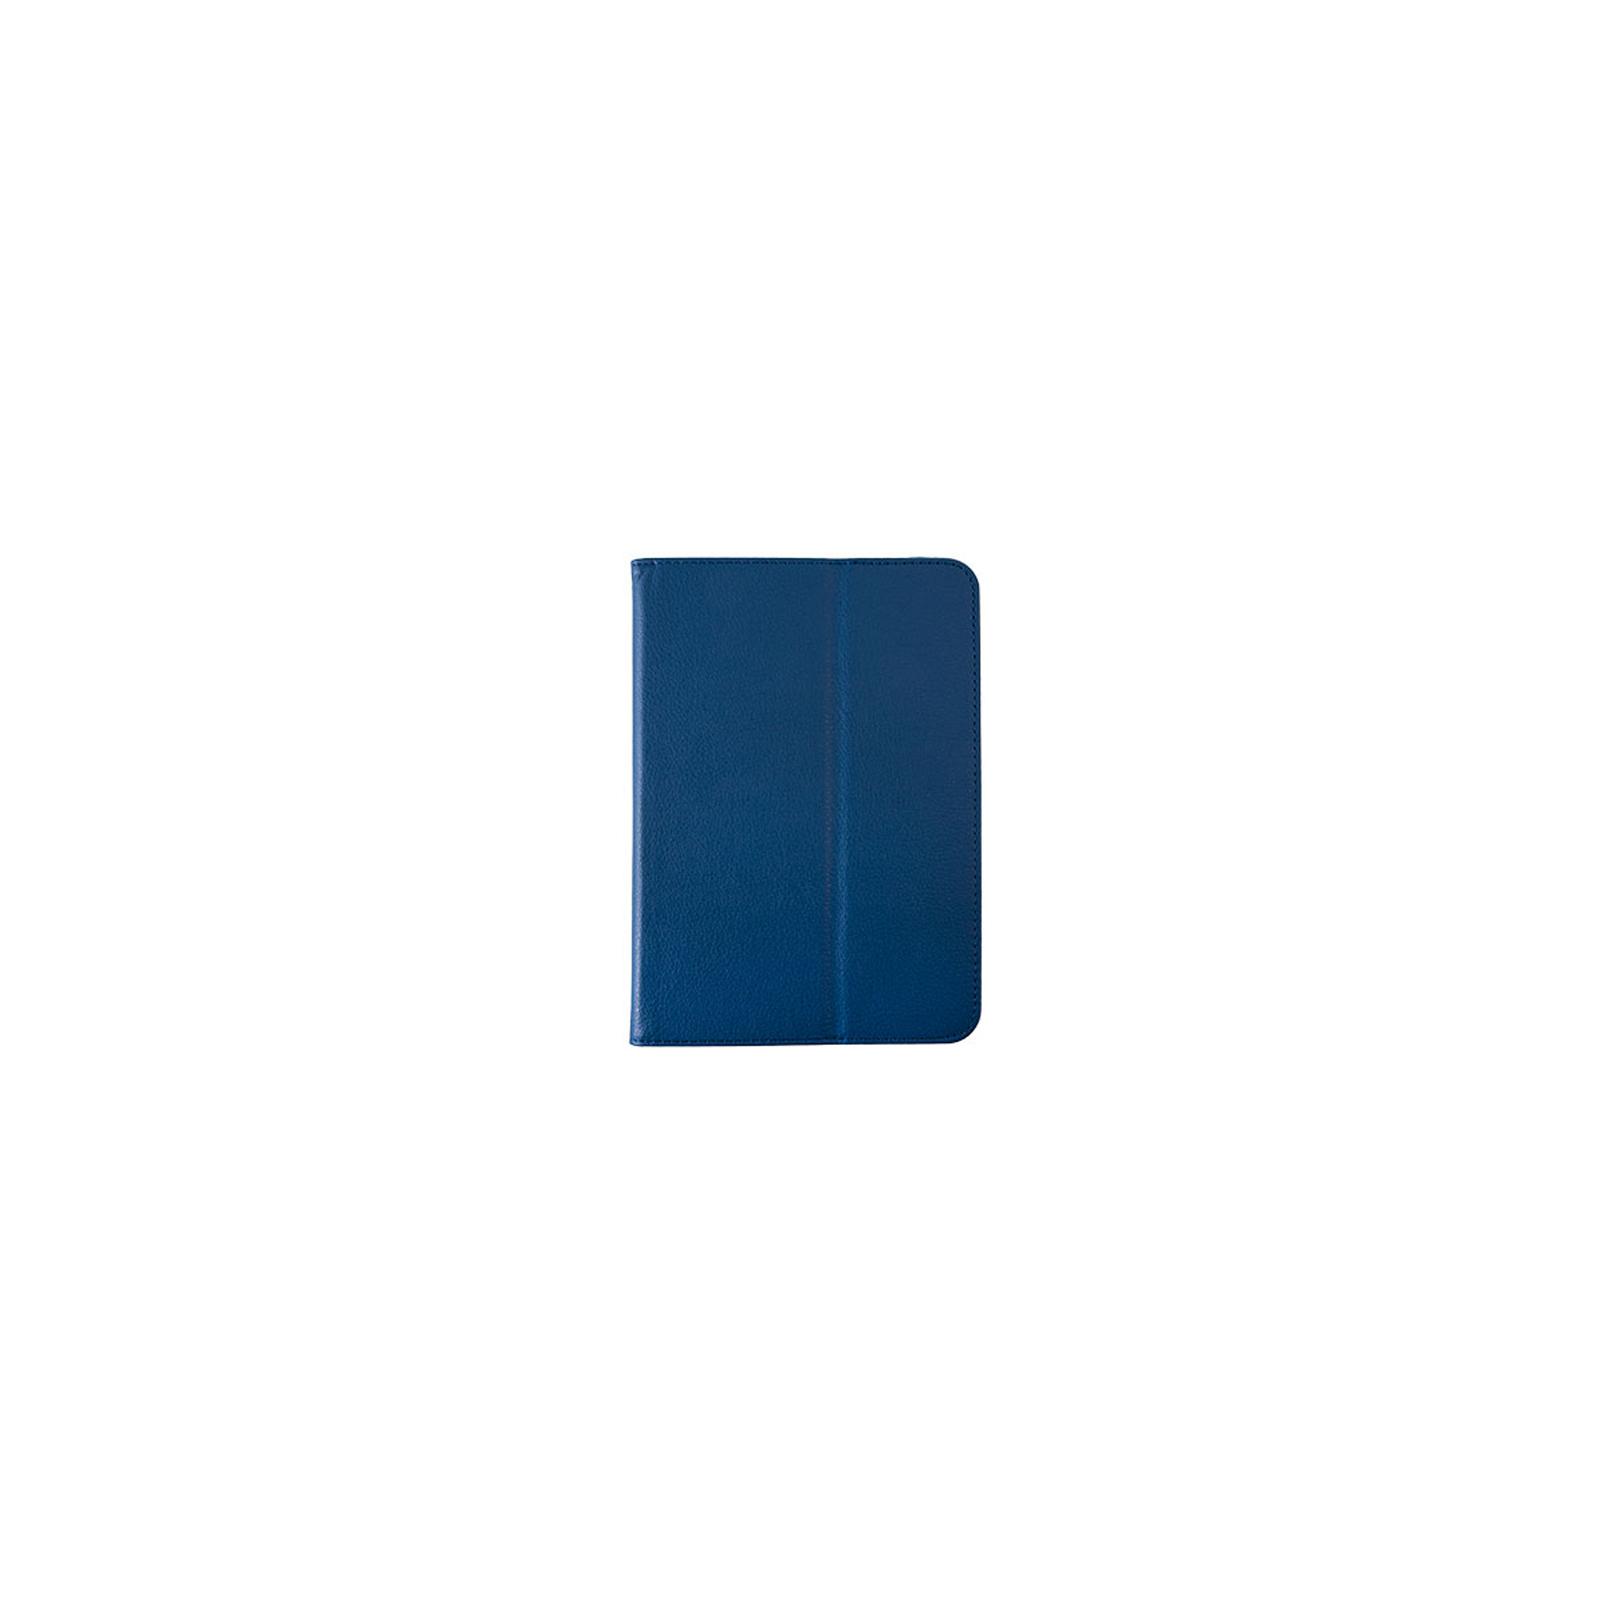 "Чехол для планшета Vellini 7"" Universal stand Dark Blue (216877)"